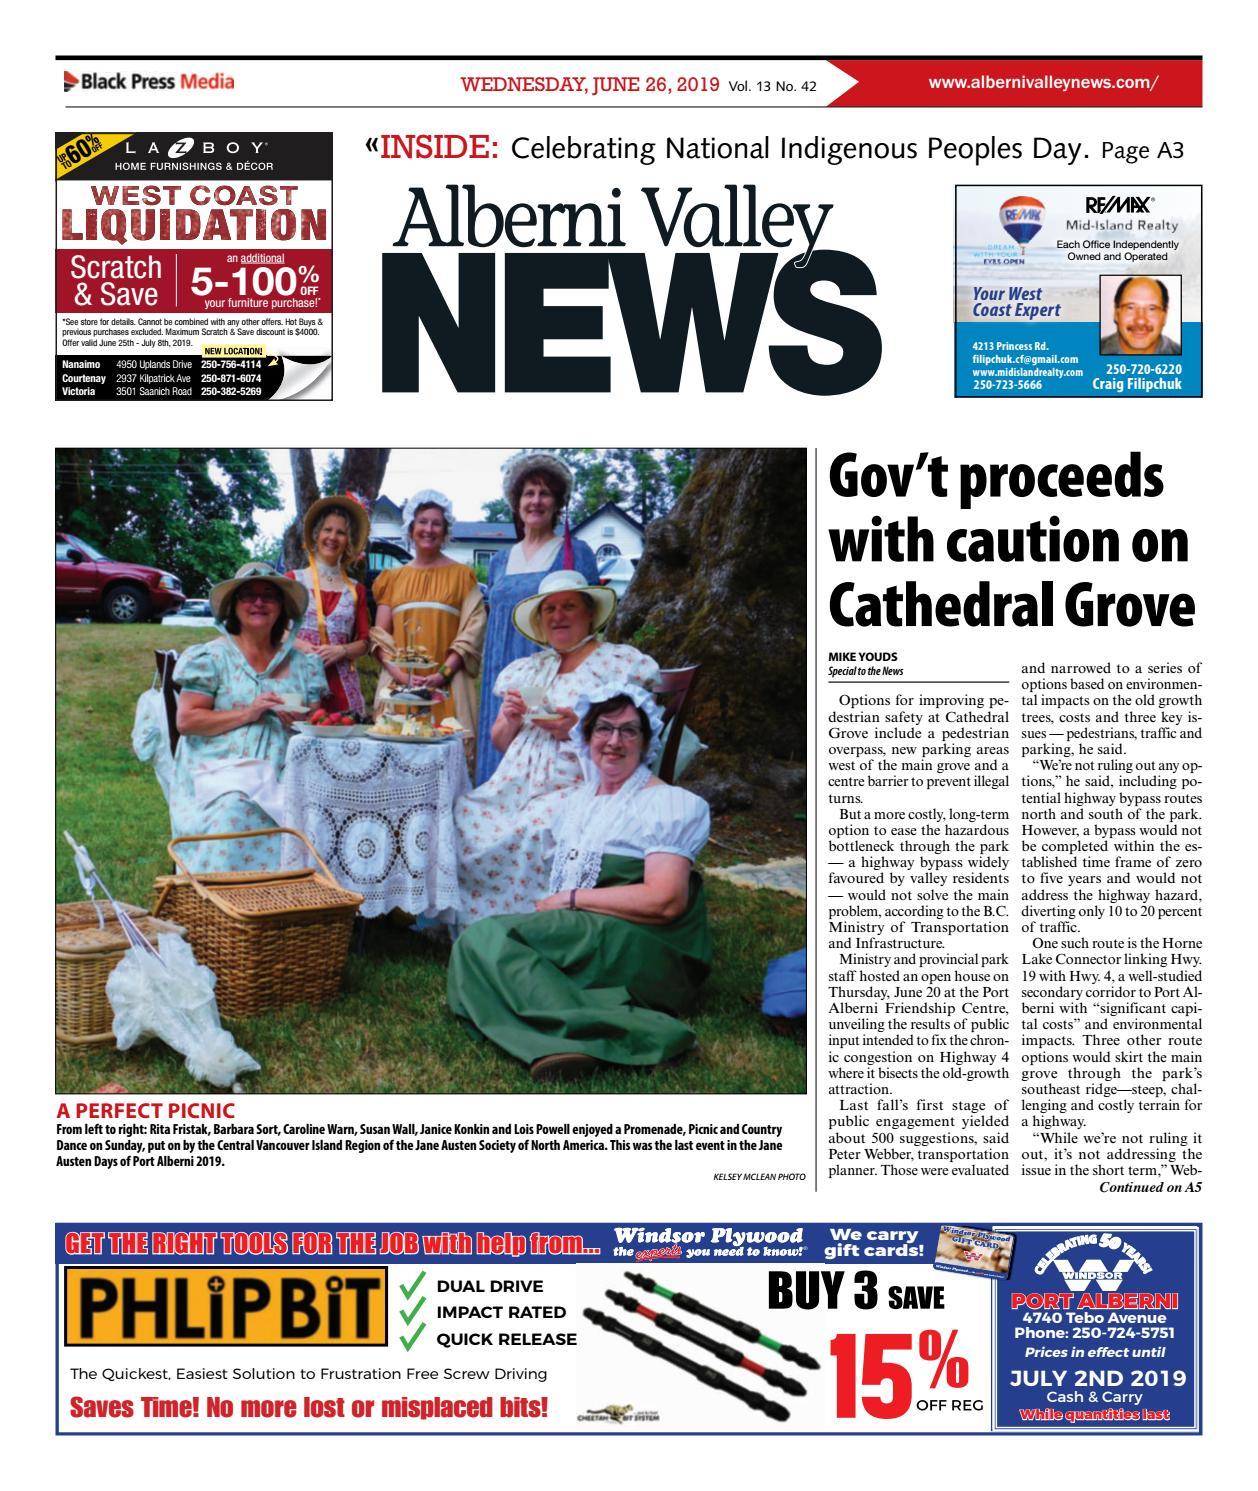 Alberni Valley News, June 26, 2019 by Black Press Media Group - issuu